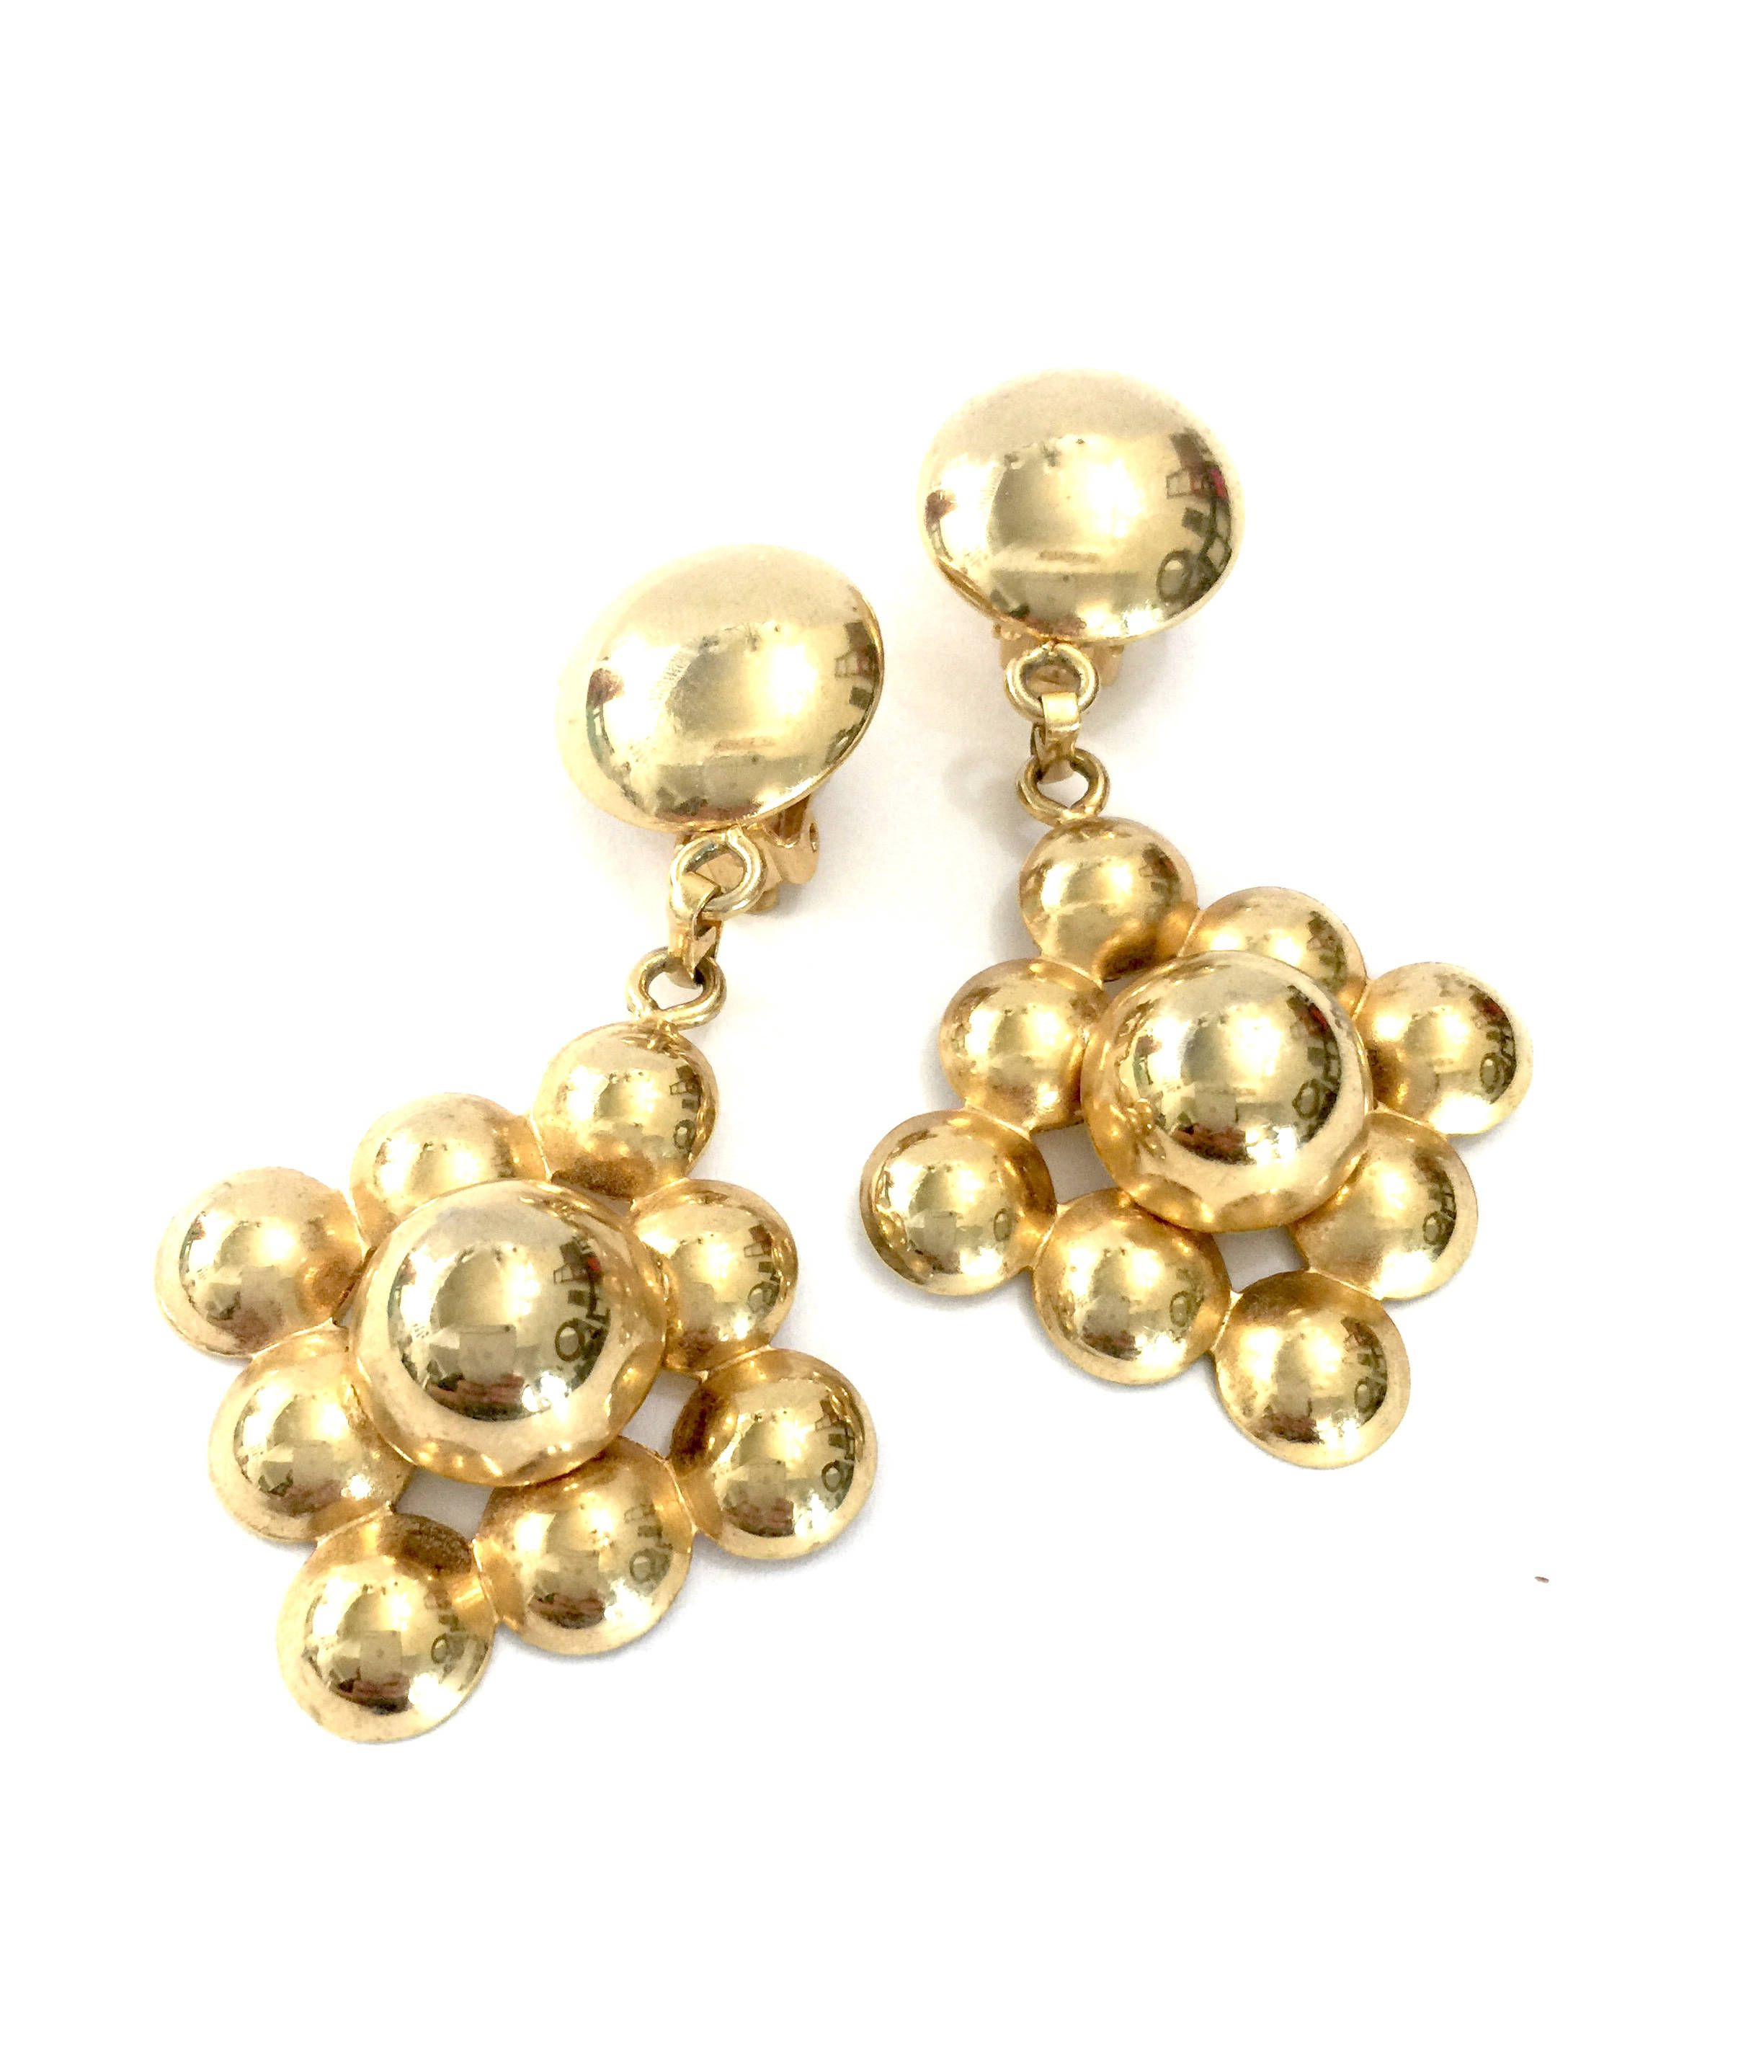 11aada81b Large Modernist Gold Tone Dangle Earrings Measure: Approx. 3 x 1 5/8 ...